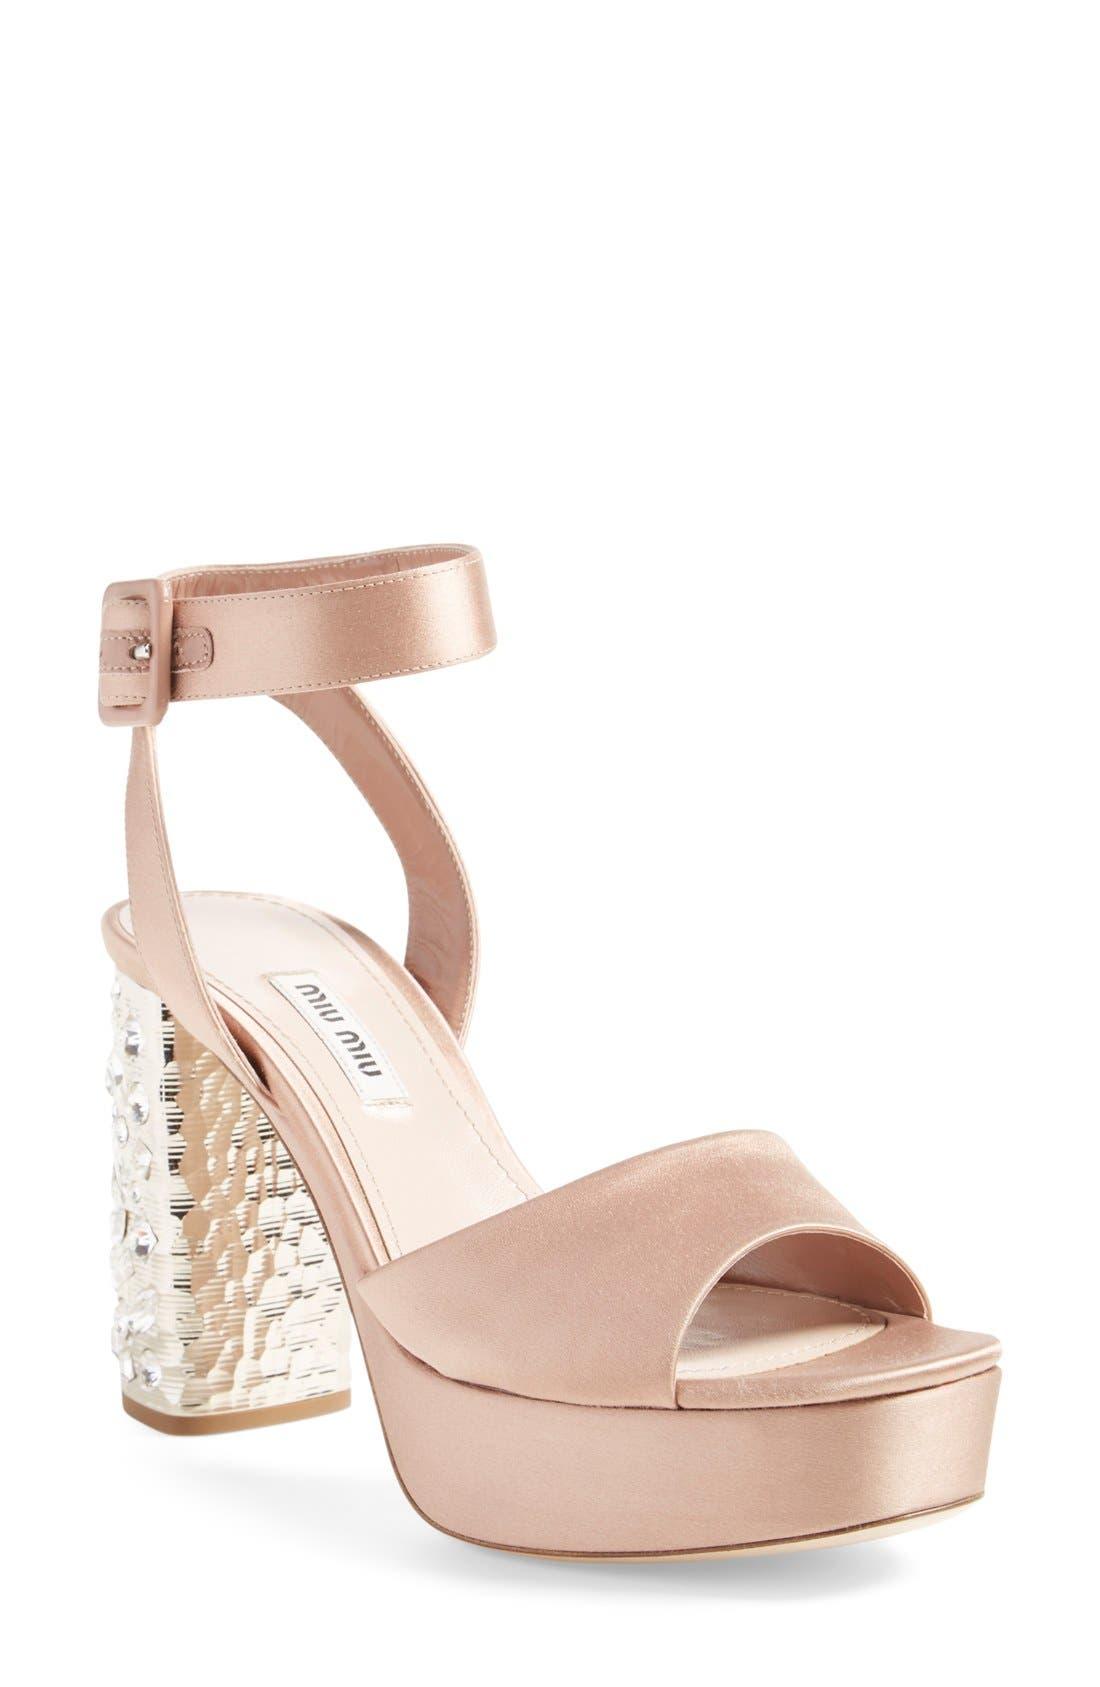 Alternate Image 1 Selected - Miu Miu Studded Block Heel Platform Sandal (Women) (Nordstrom Exclusive)